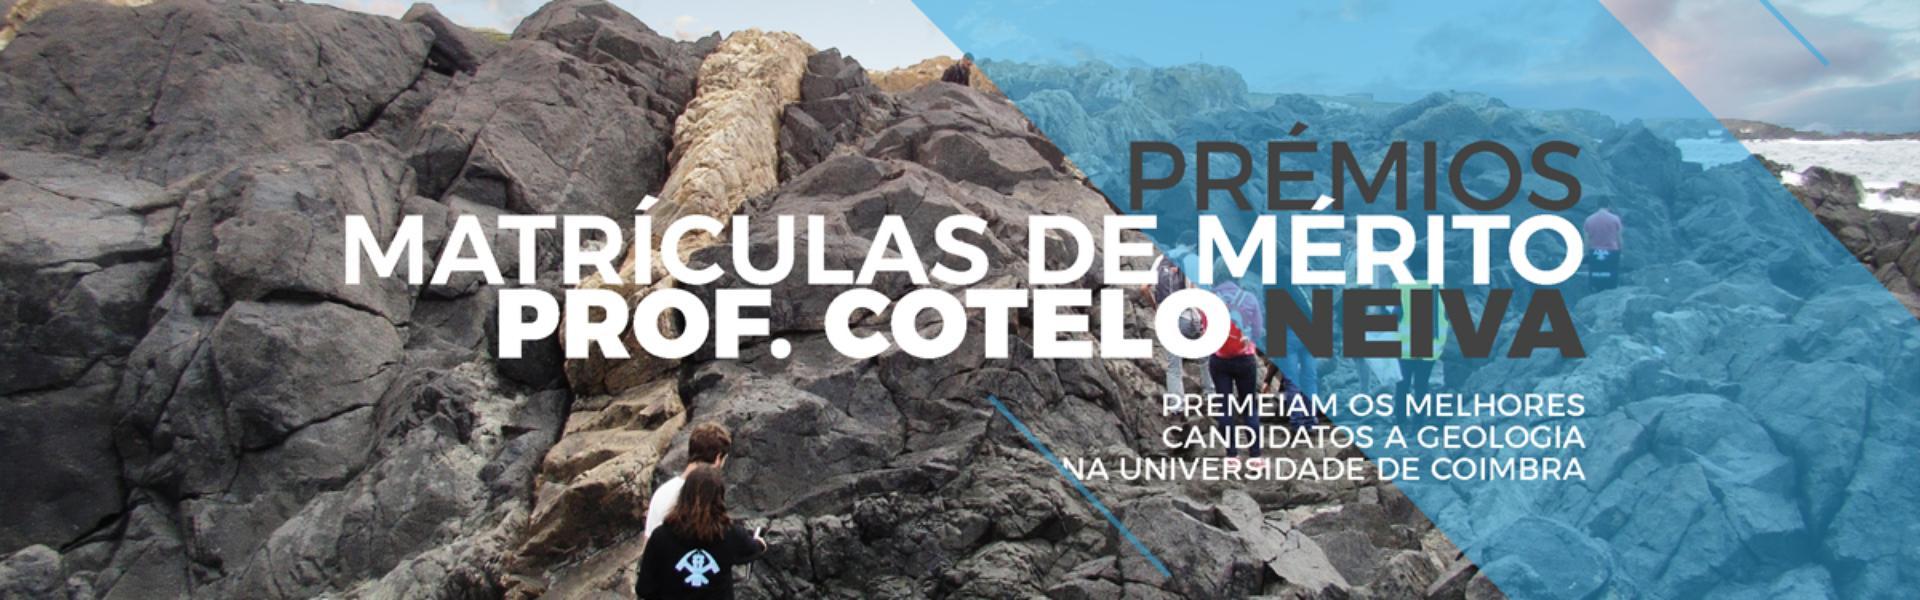 "Prémios ""Matrículas de Mérito Professor Cotelo Neiva"" - Aviso de Abertura"